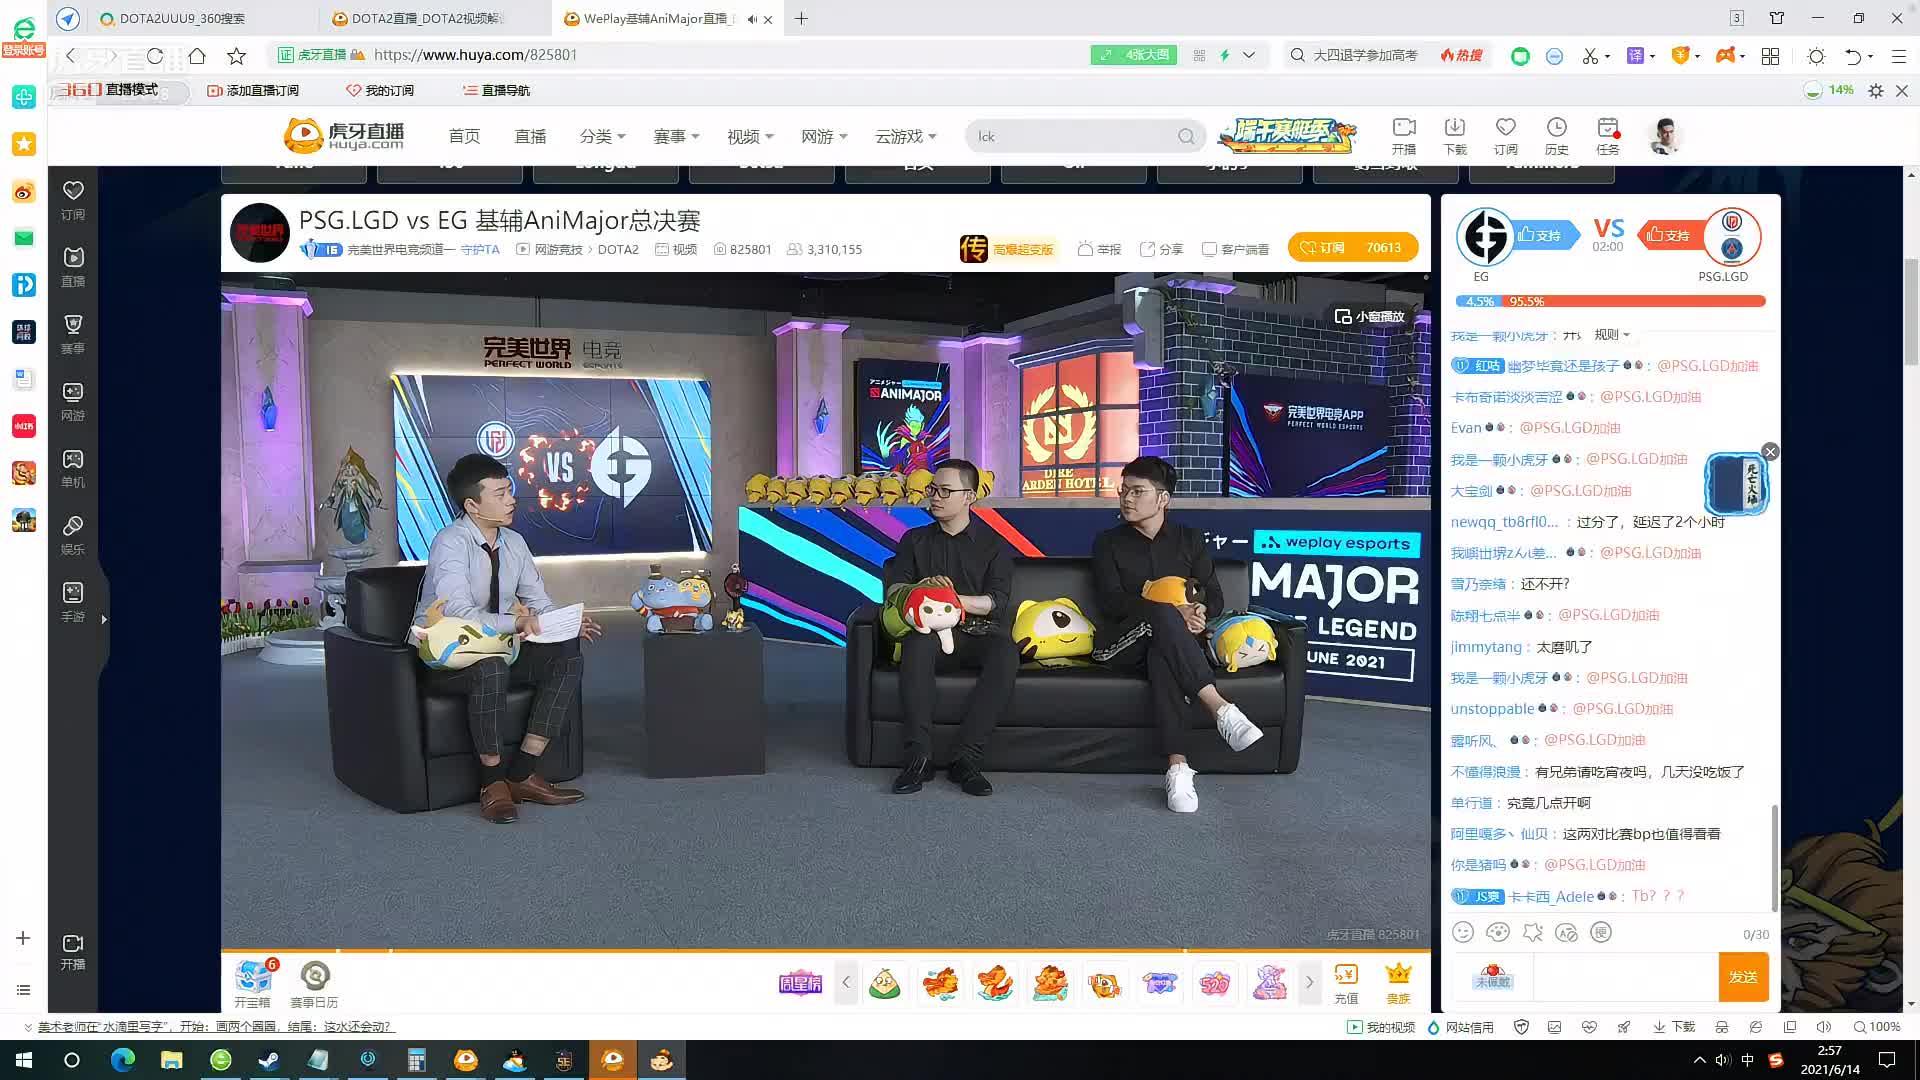 【Sccc解说】LGD 3-0 EG 基辅Major总决赛BO5